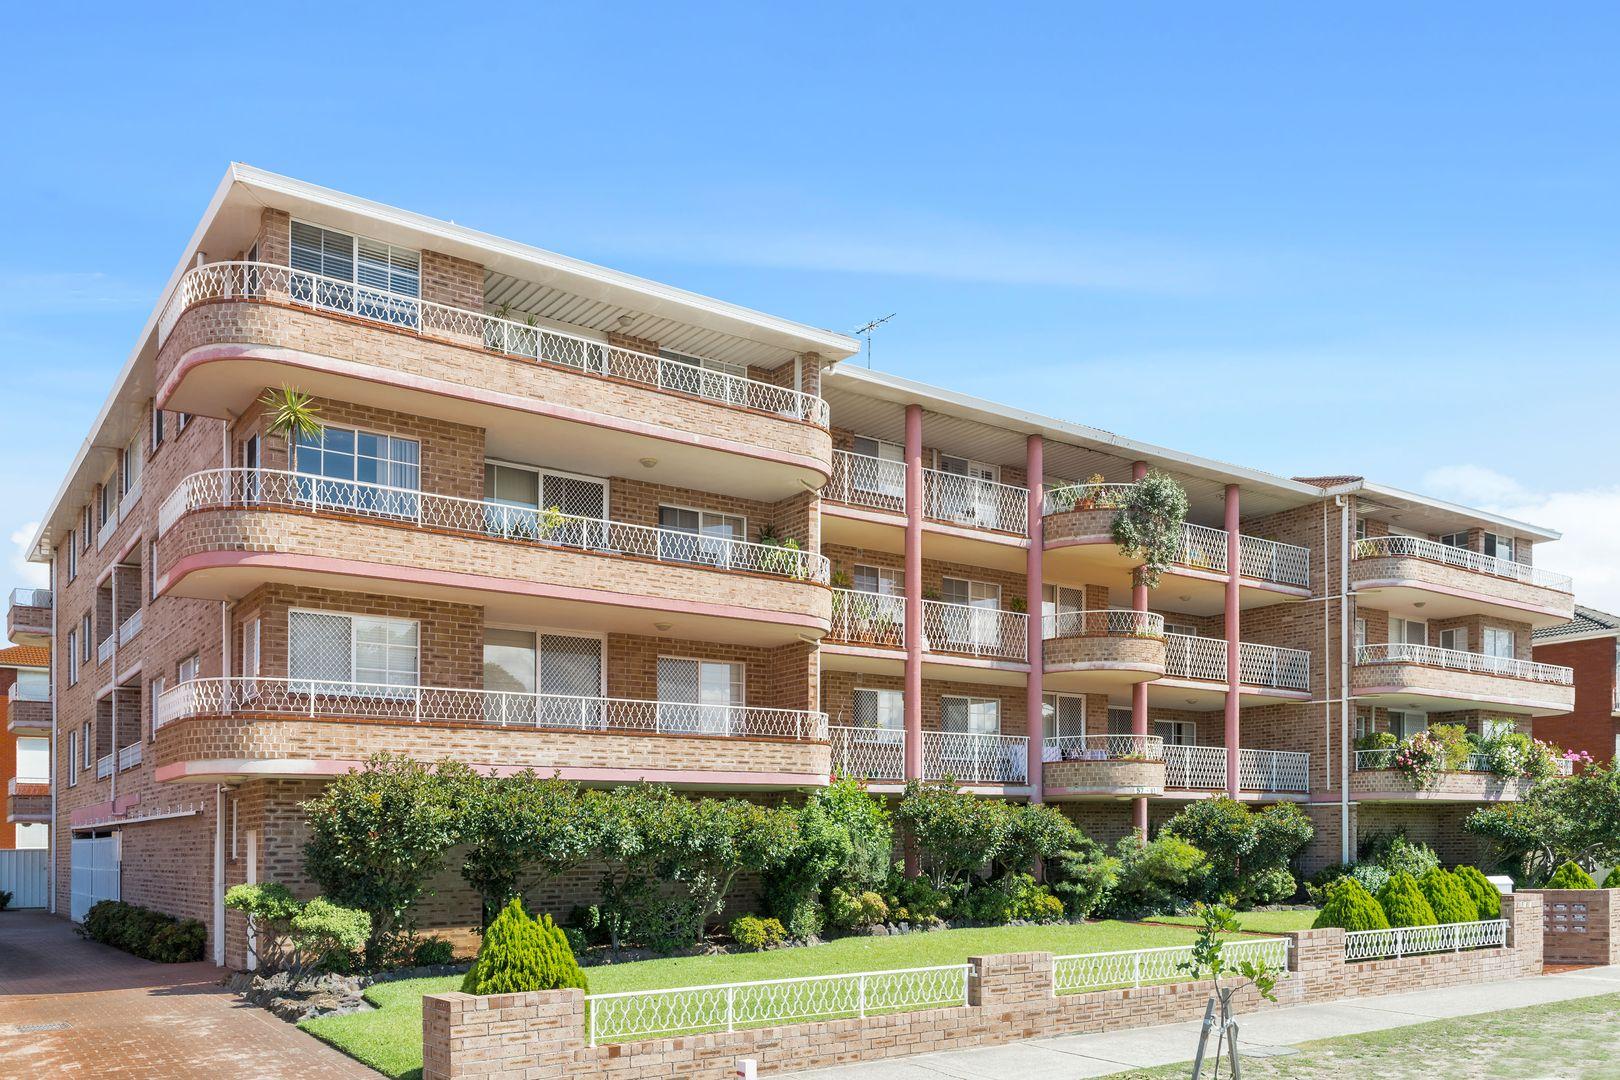 16/57-61 Banks Street, Monterey NSW 2217, Image 0